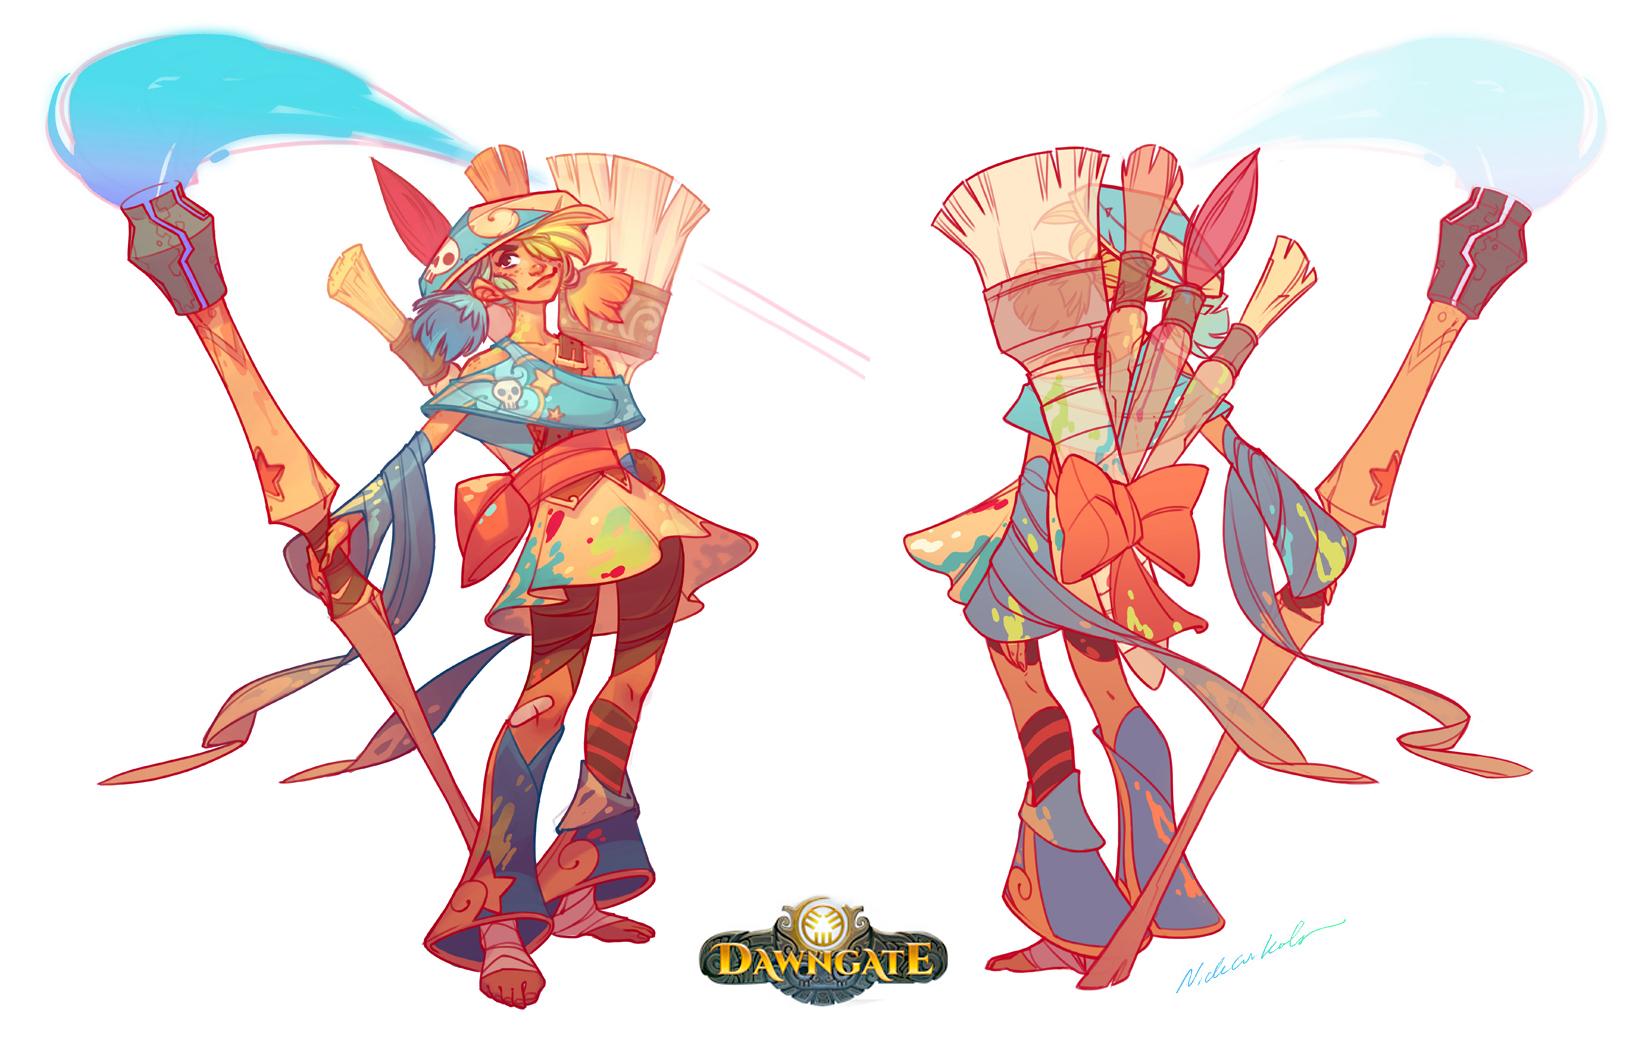 Dawngate Concept - Zeri! by nicholaskole